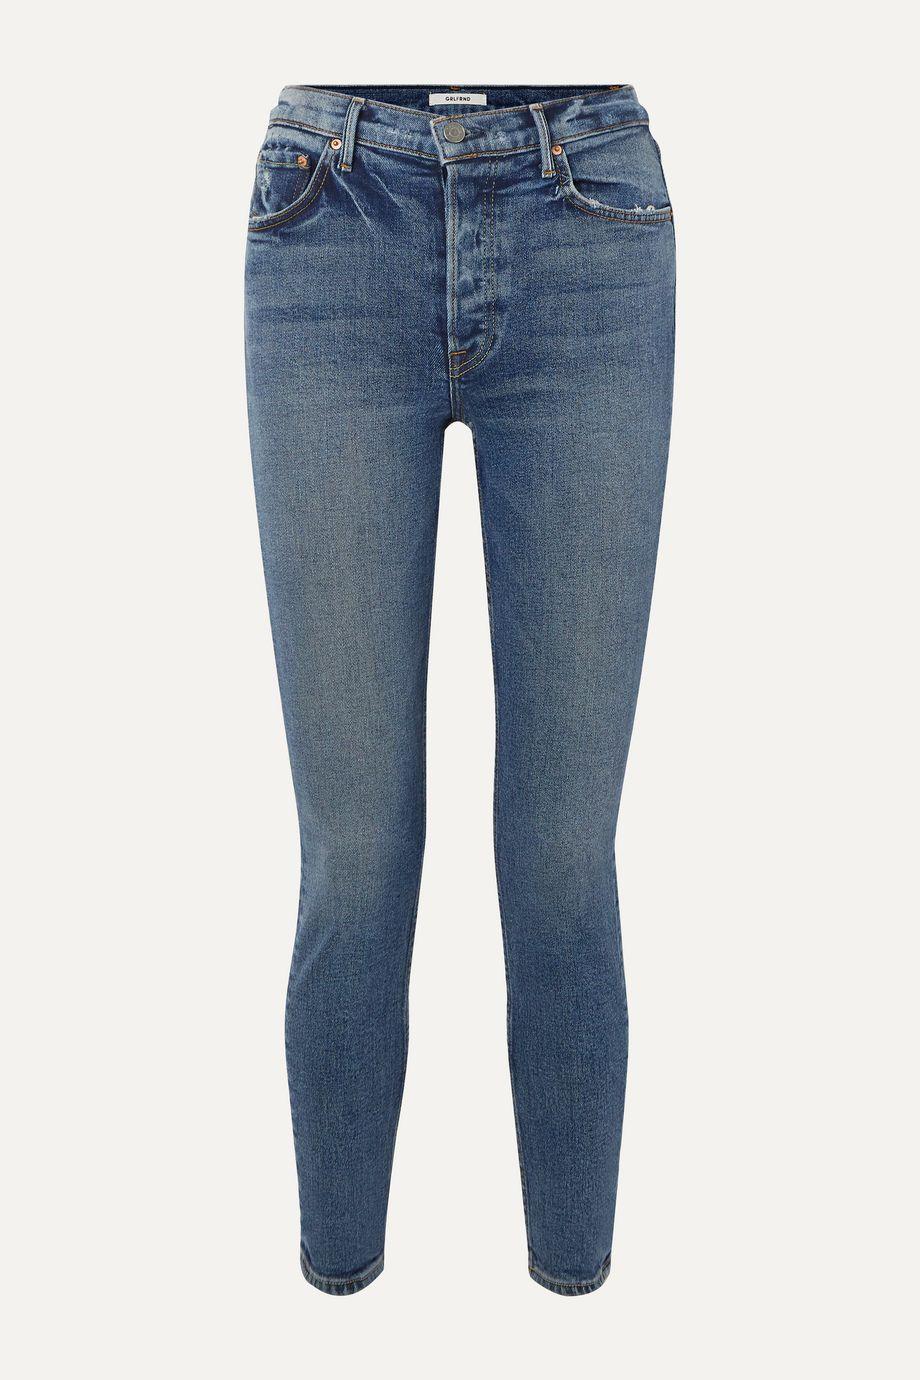 GRLFRND Karolina high-rise skinny jeans